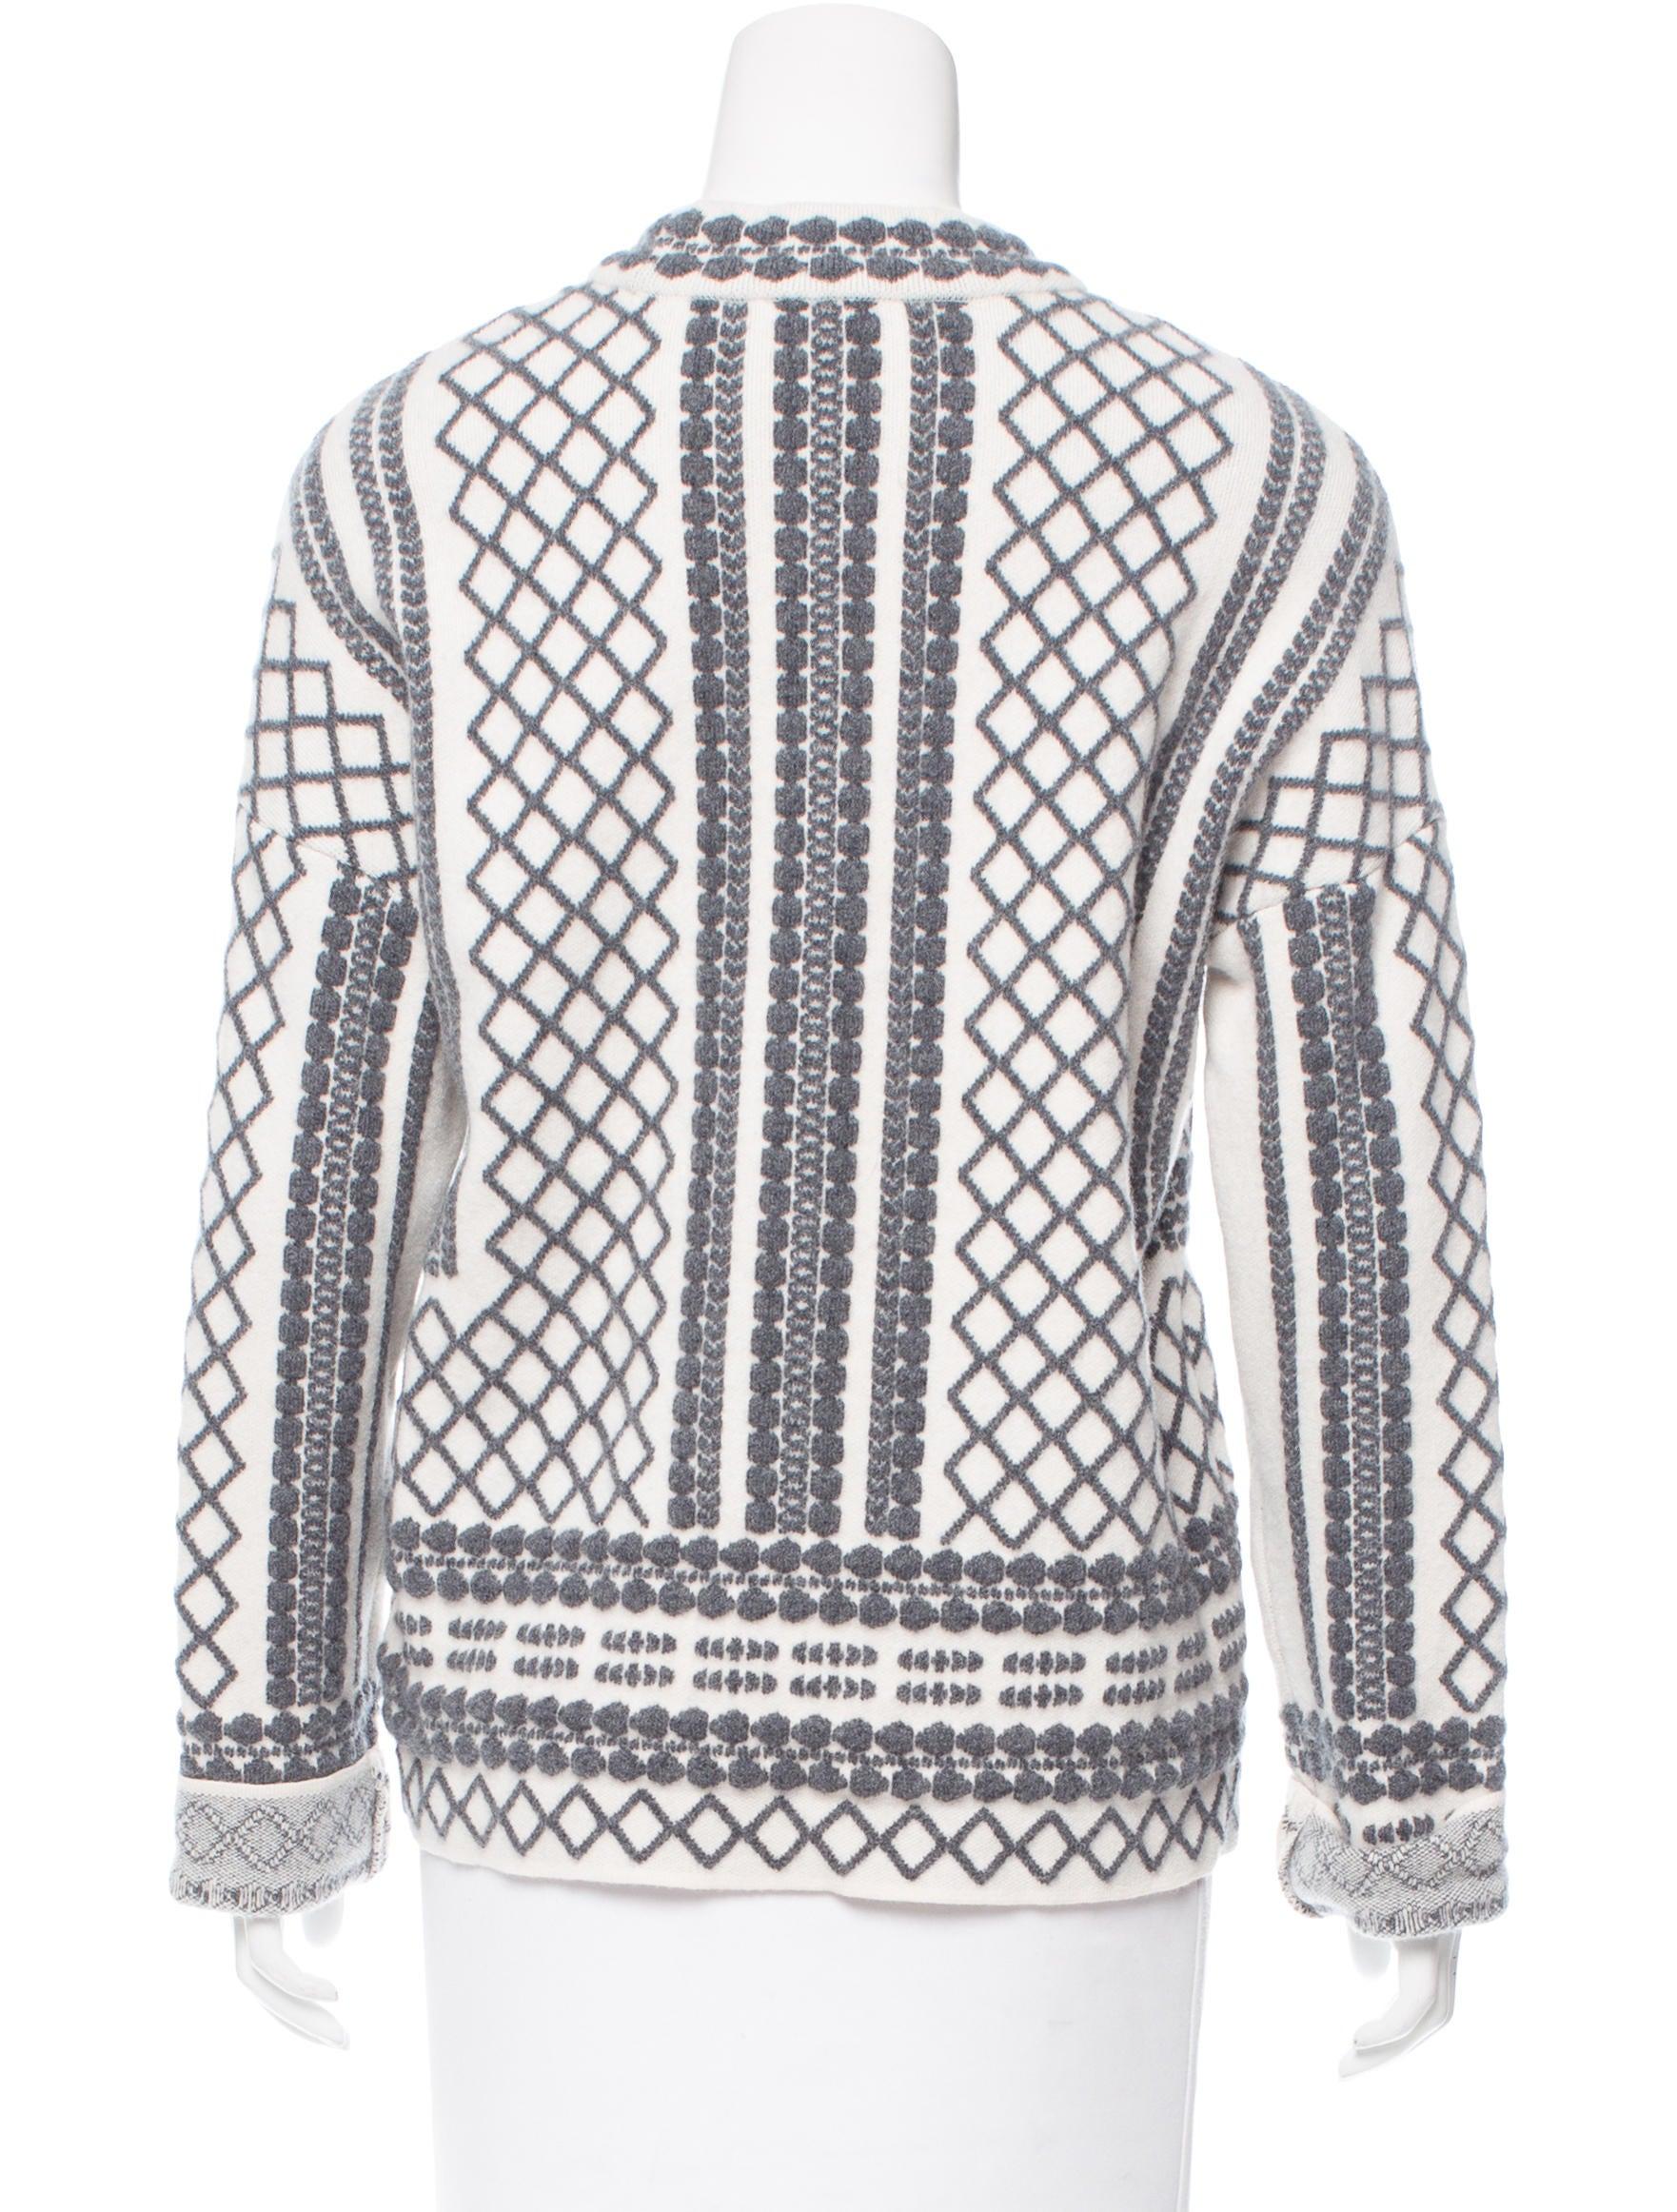 Tory Burch Jacquard Wool Sweater - Clothing